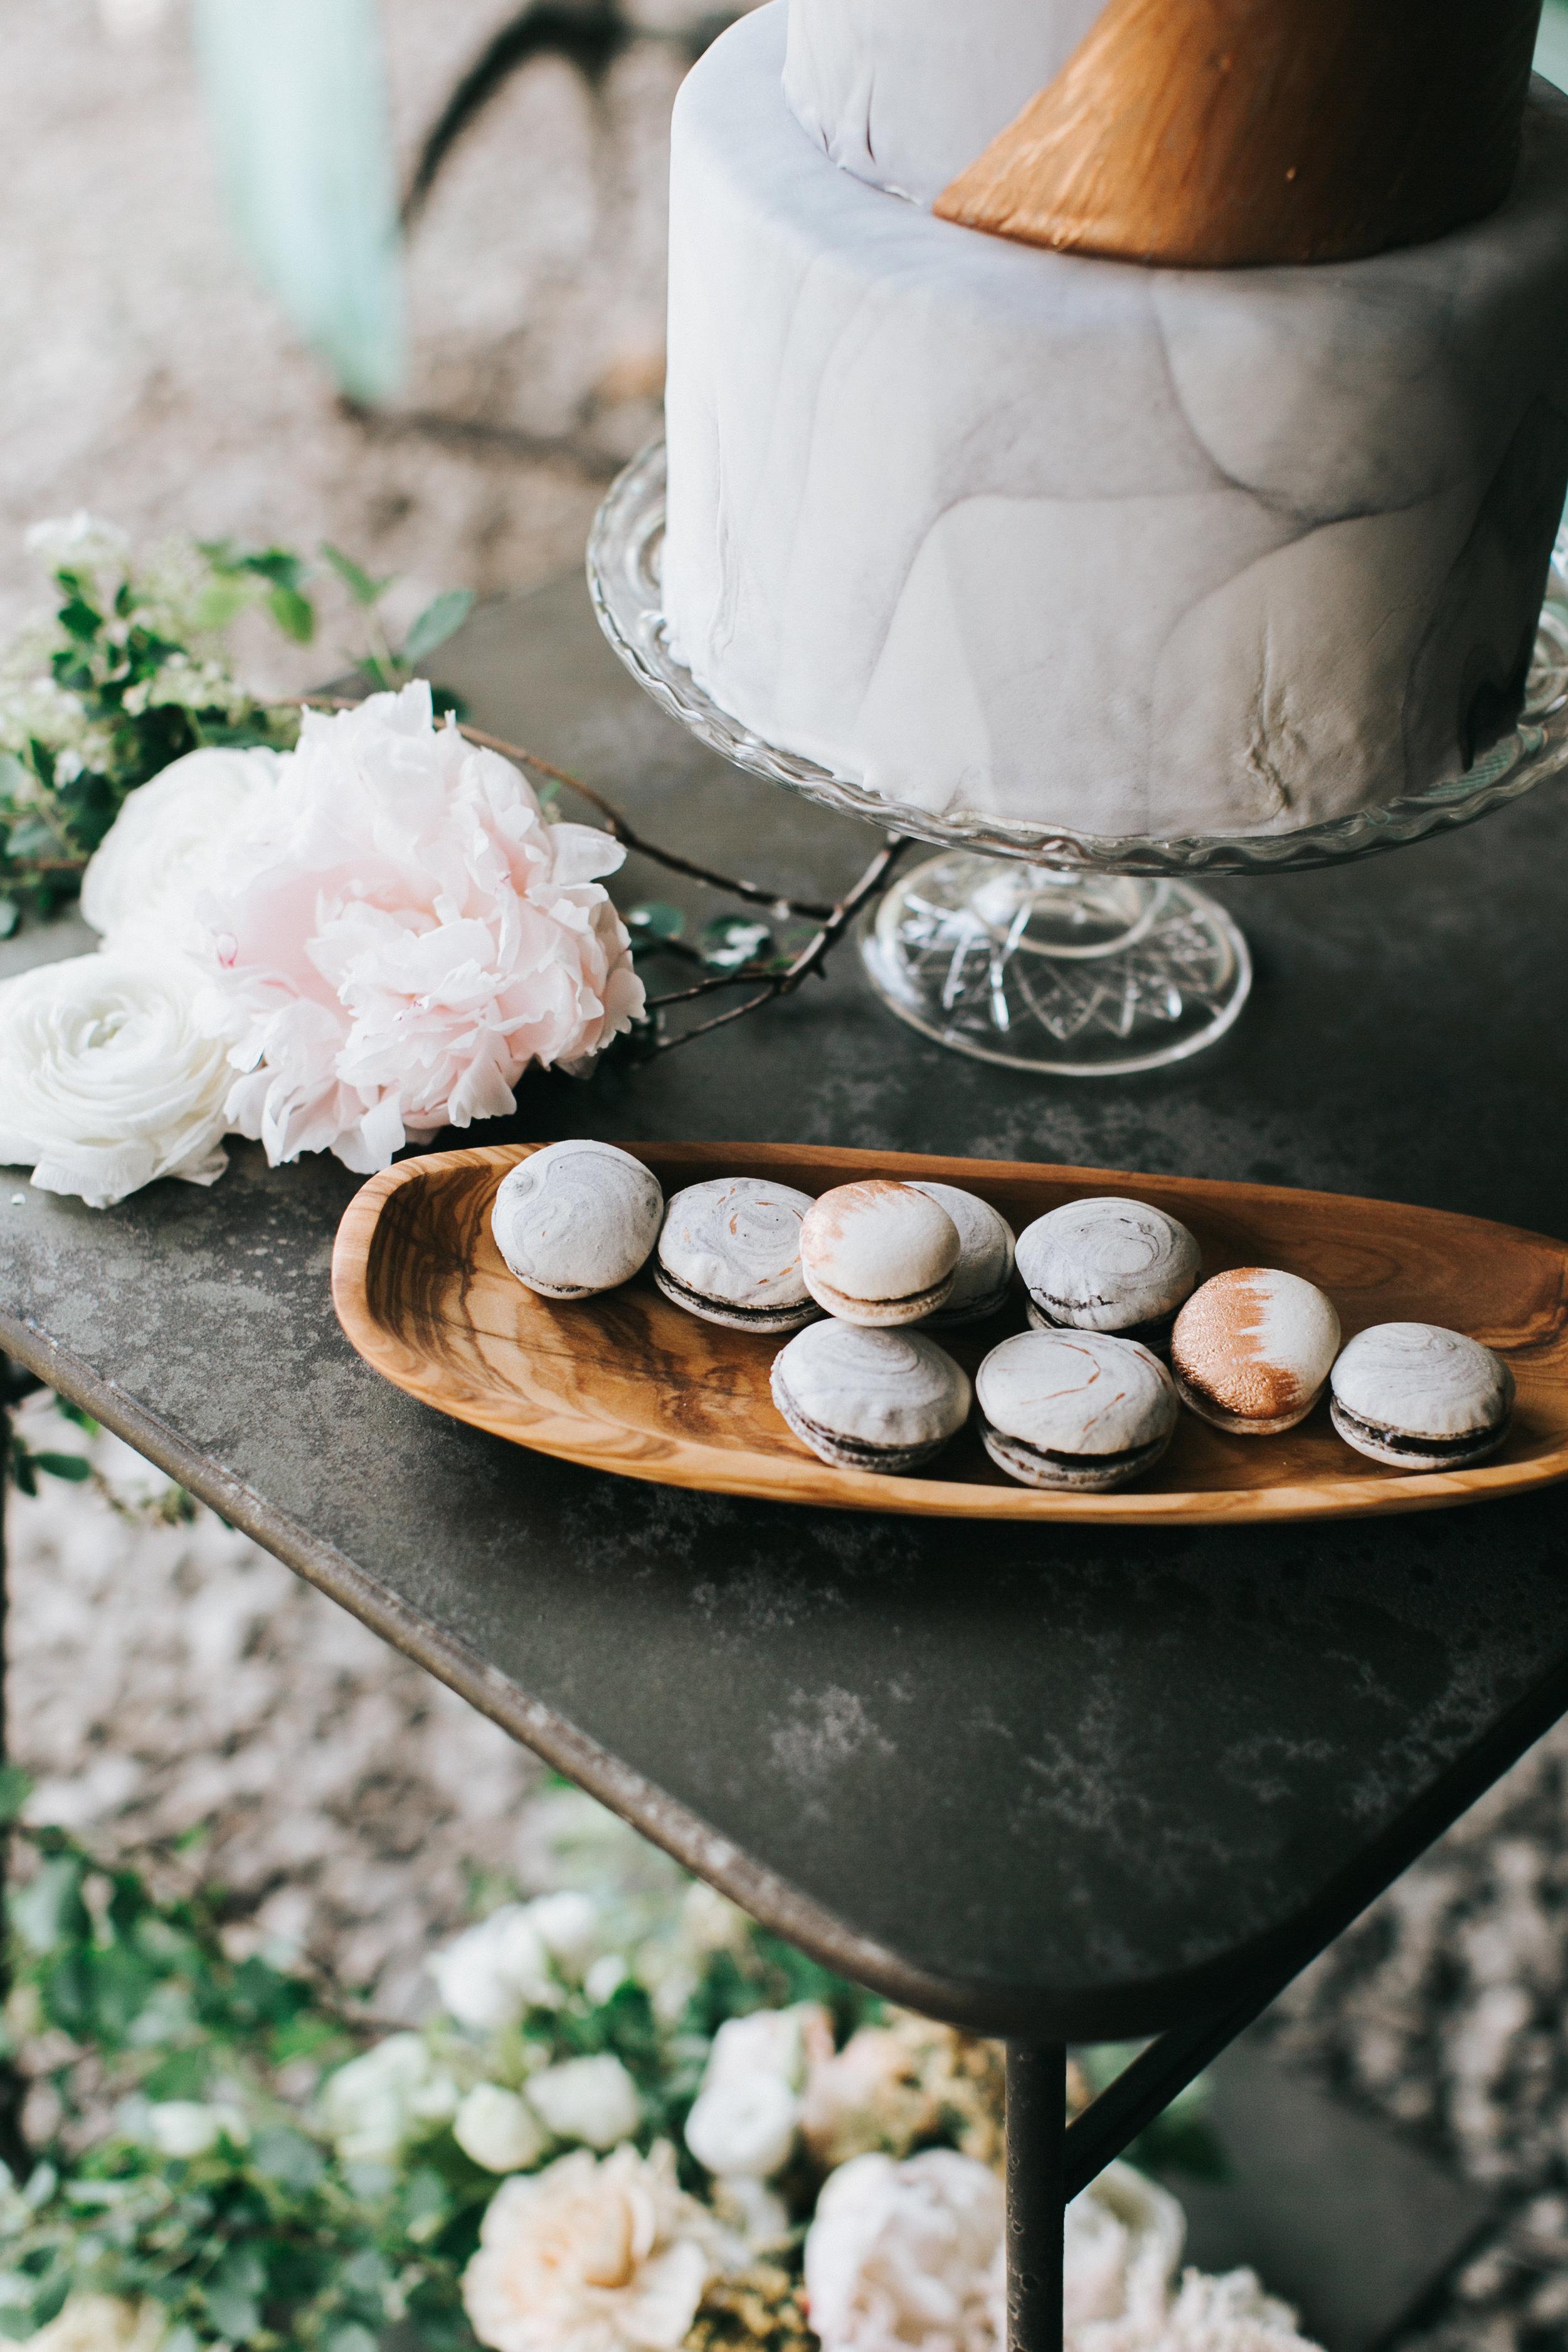 Watershed-Floral-Maine-Maritime-Wedding-Bridal-Bouquet-Centerpieces-0106.jpg